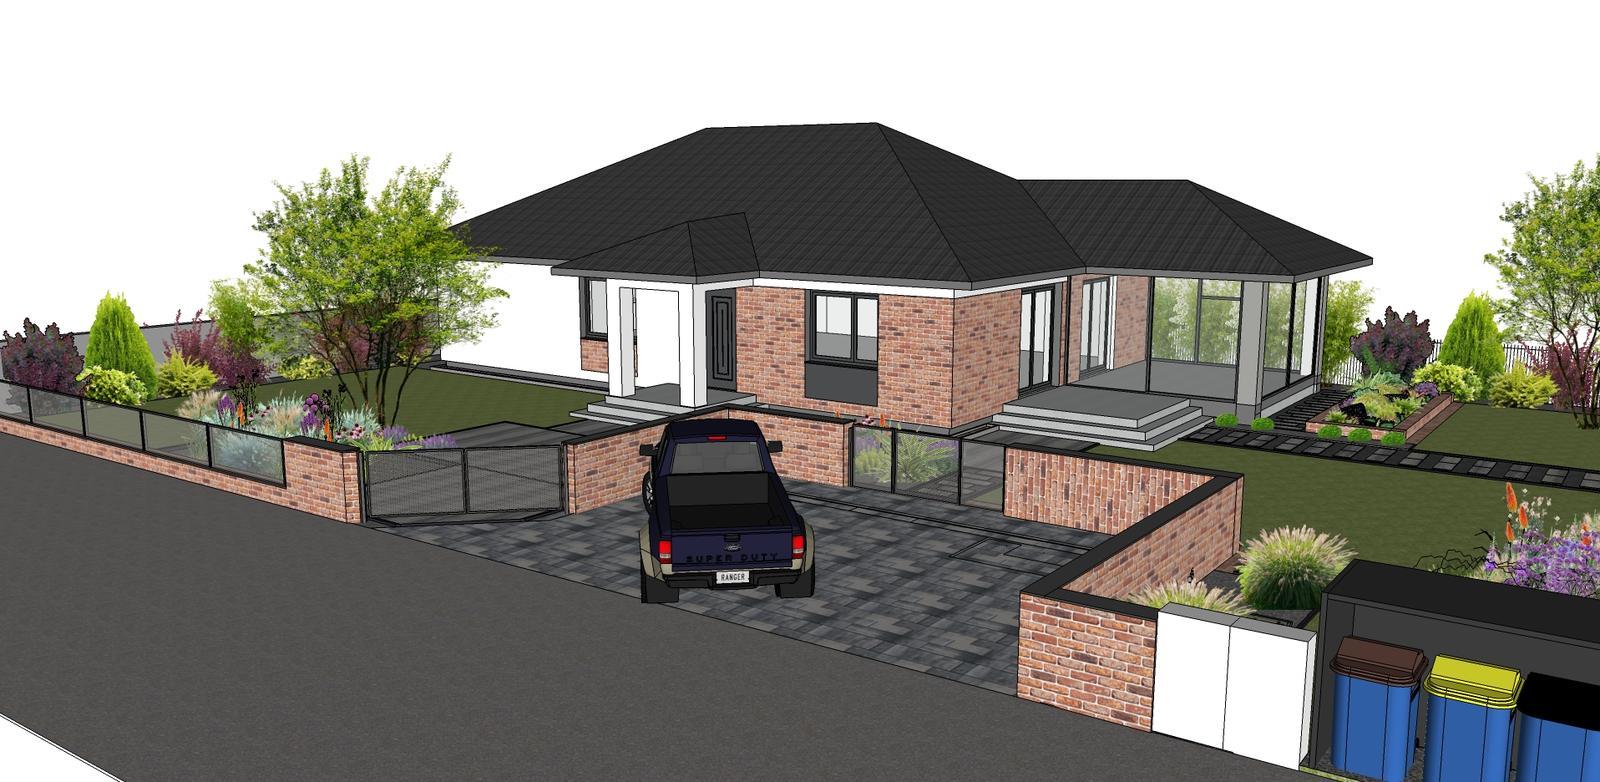 Okolie domu - Obrázok č. 9